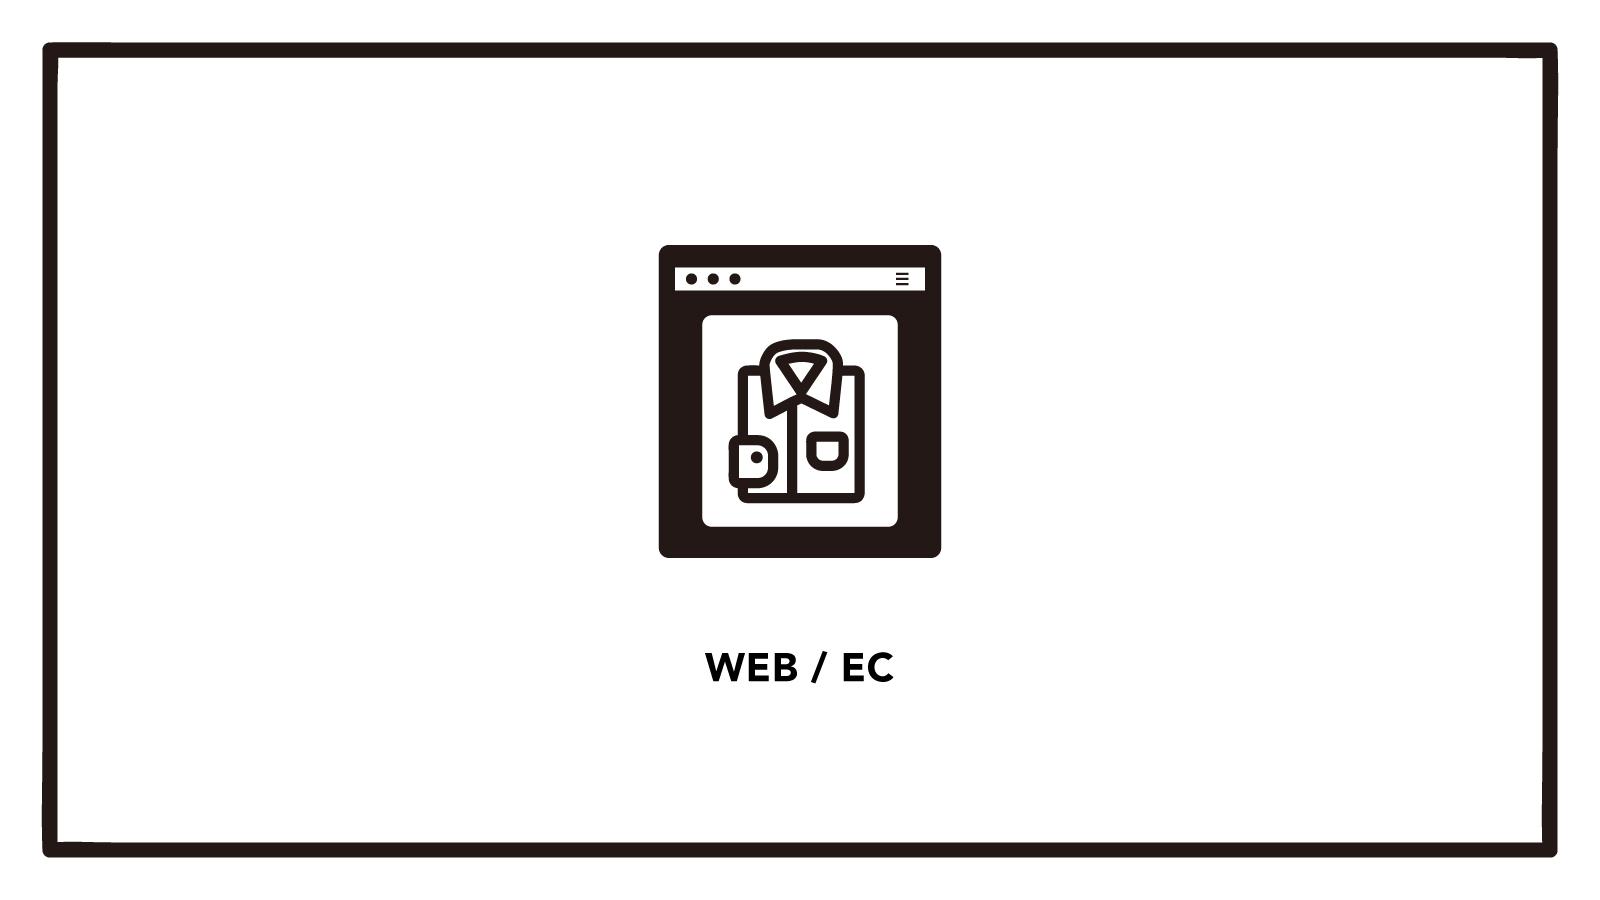 【EC運用】【webディレクター】スタッフ募集!in 大阪◎のカバー写真